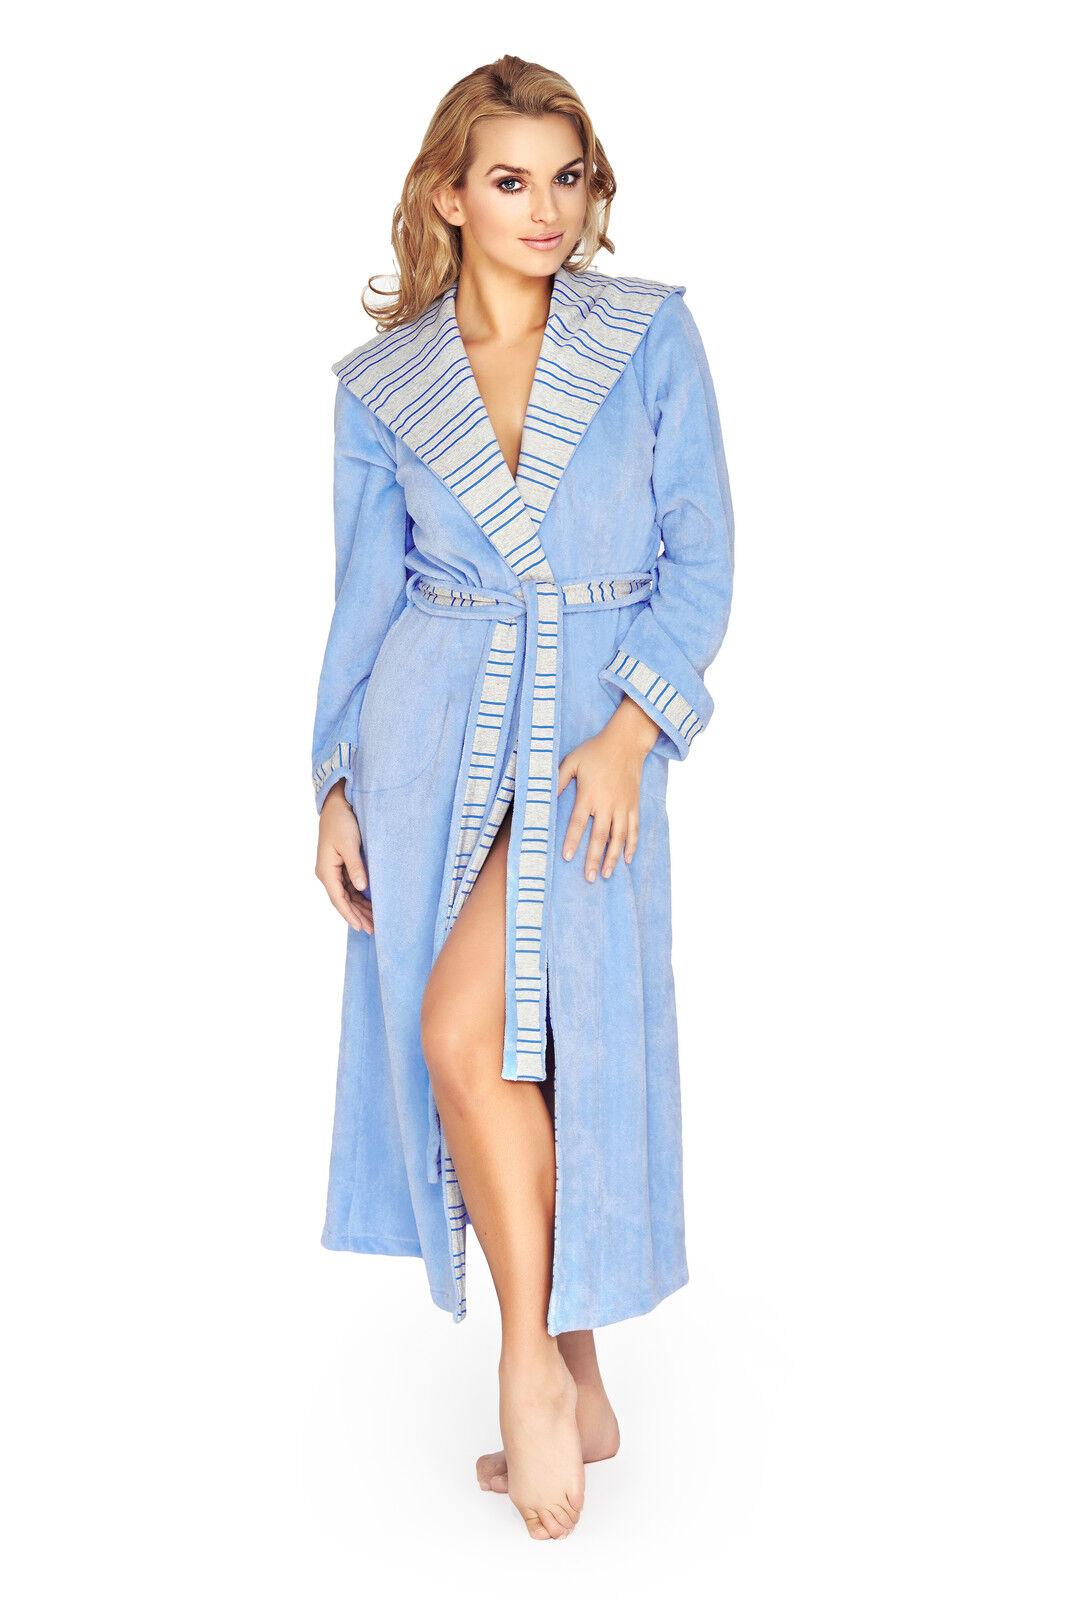 Women s Luxury SOFT Cotton Bath Robe Housecoat Dressing Gown Bathrobe S M L  XL 8ab7becc5